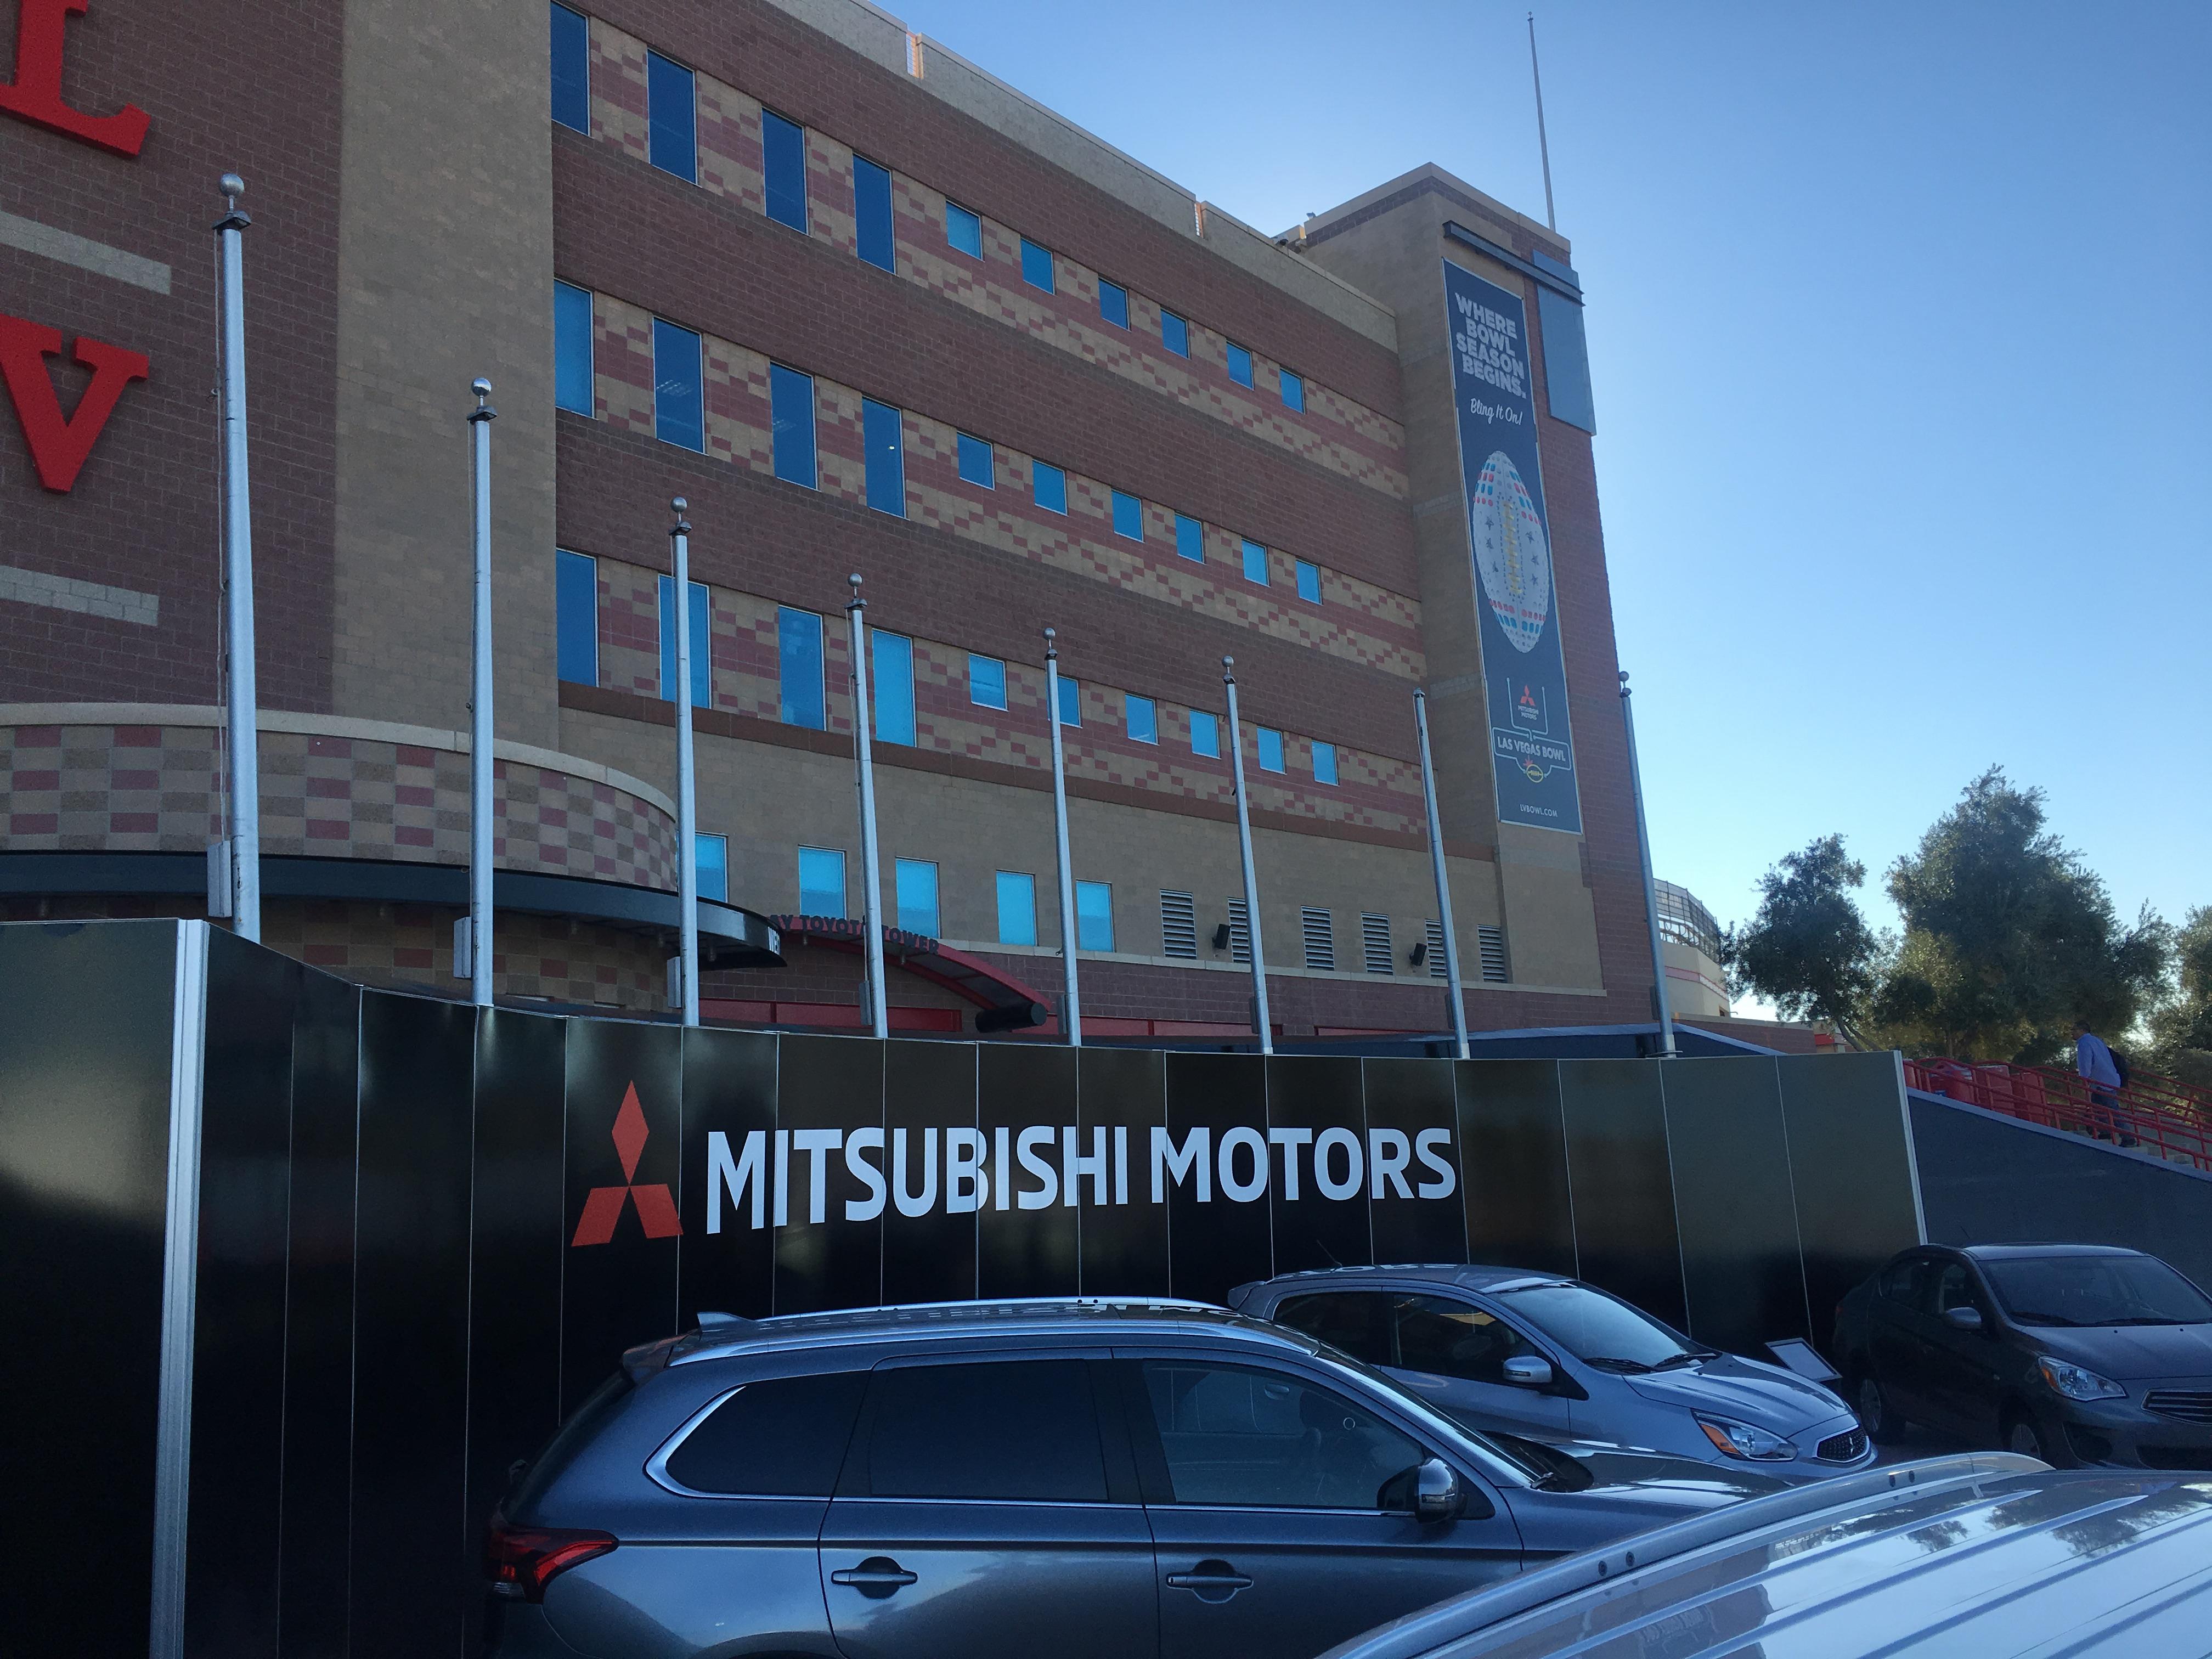 mitsubishi has 19 cars at las vegas bowl to activate title